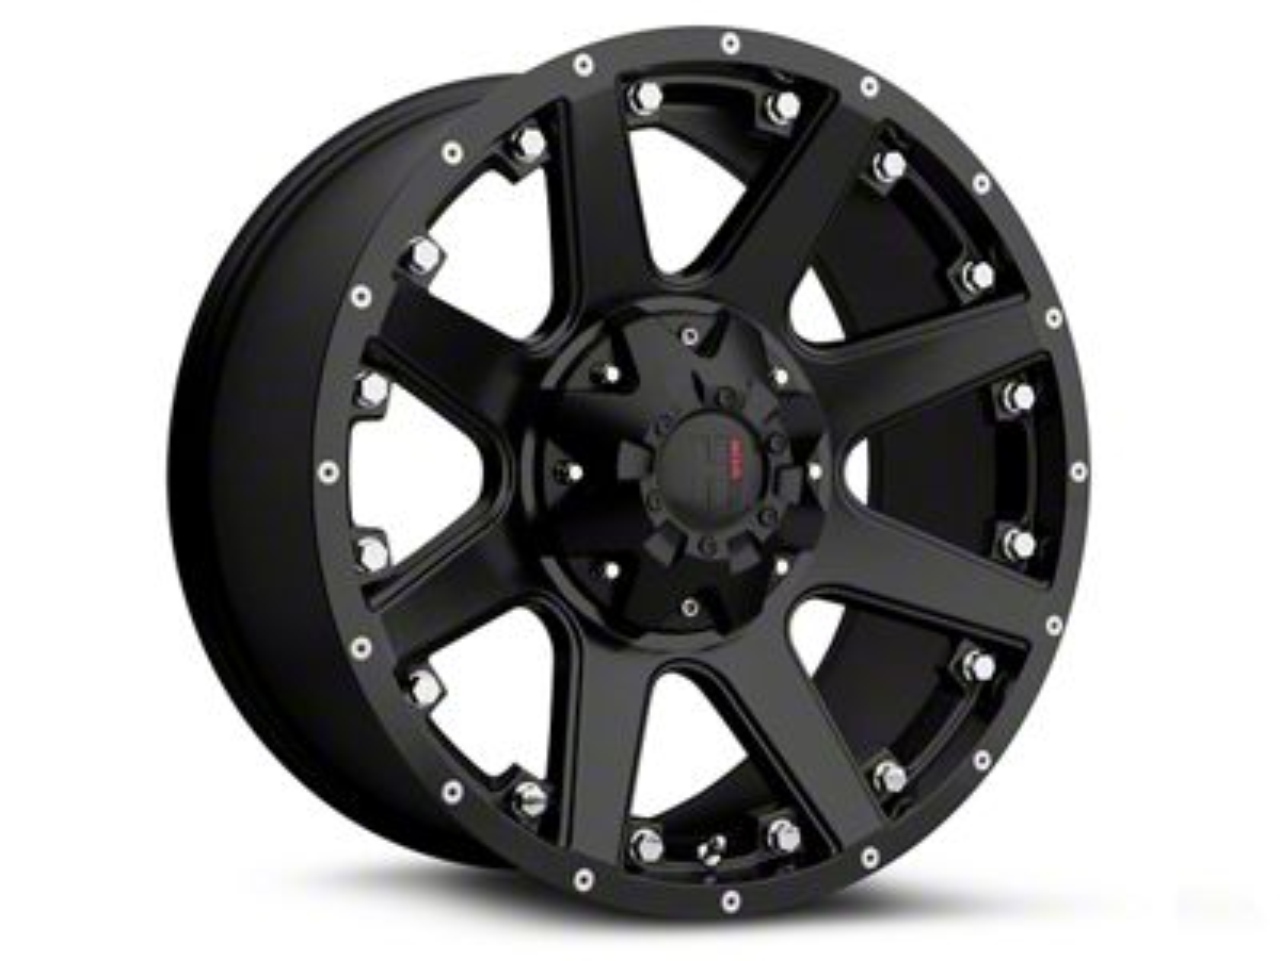 Havok Off-Road H102 Matte Black 6-Lug Wheel - 18x9 (04-08 F-150)